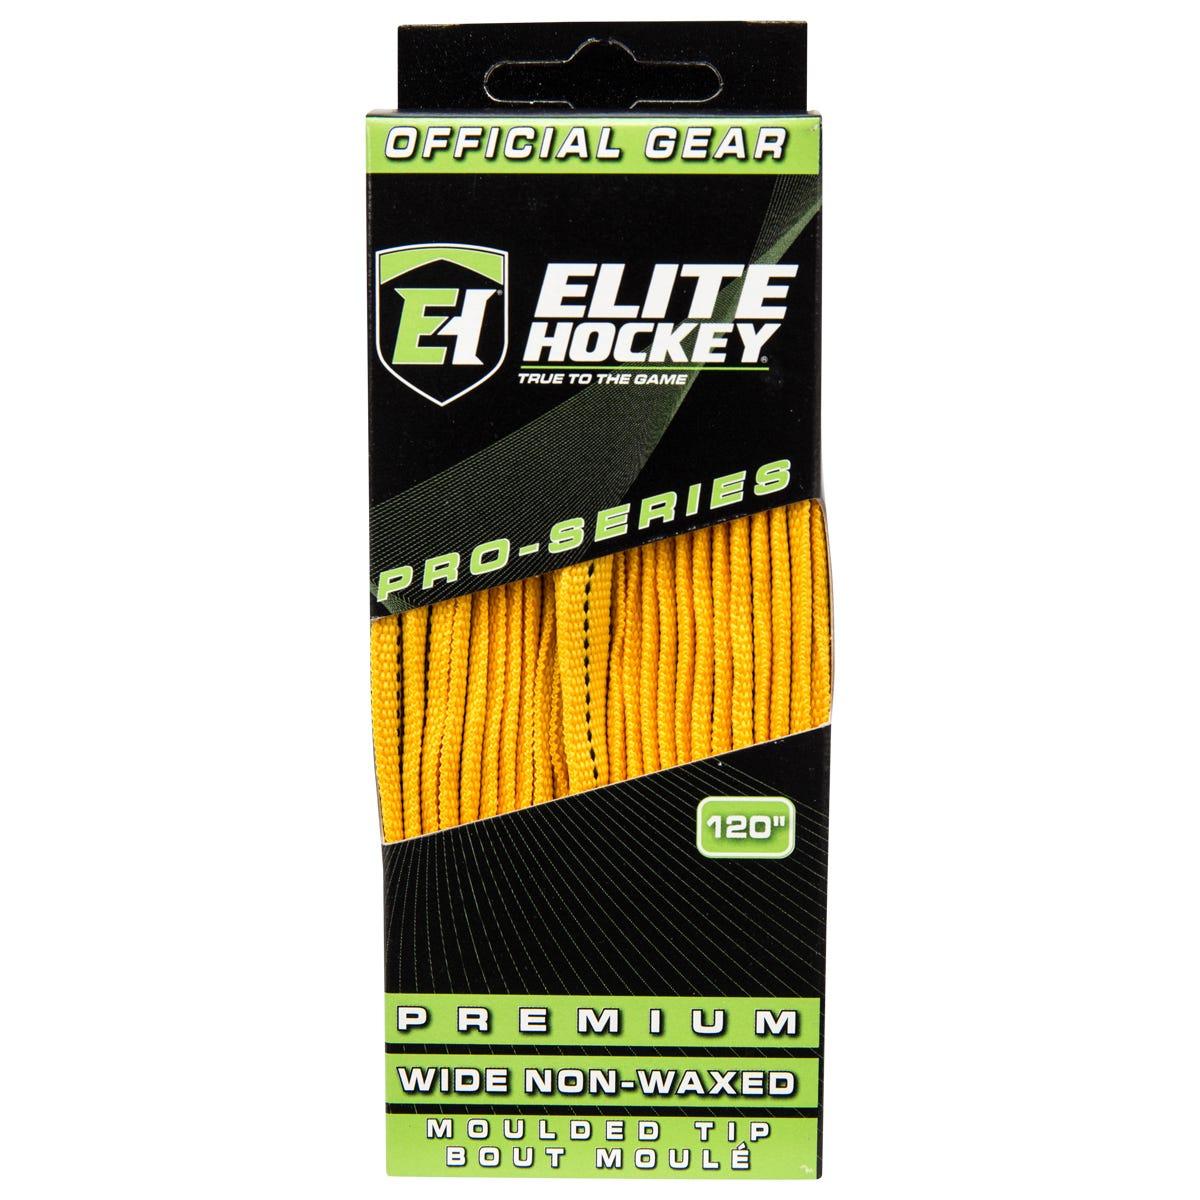 693bf8cf SKU-MS1387871 Sher-Wood Rekker EK60 Grip Youth Hockey Stick from ...